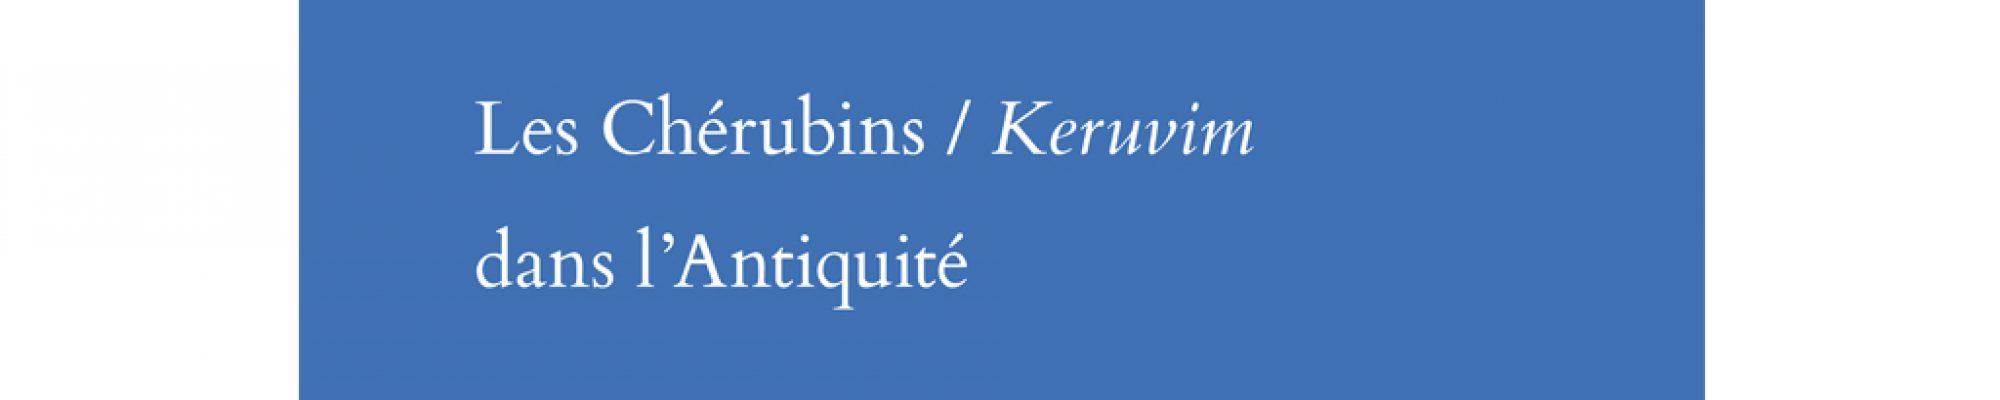 Kasion-6-Cherubins-Cover-fuer-Homepage-NEU